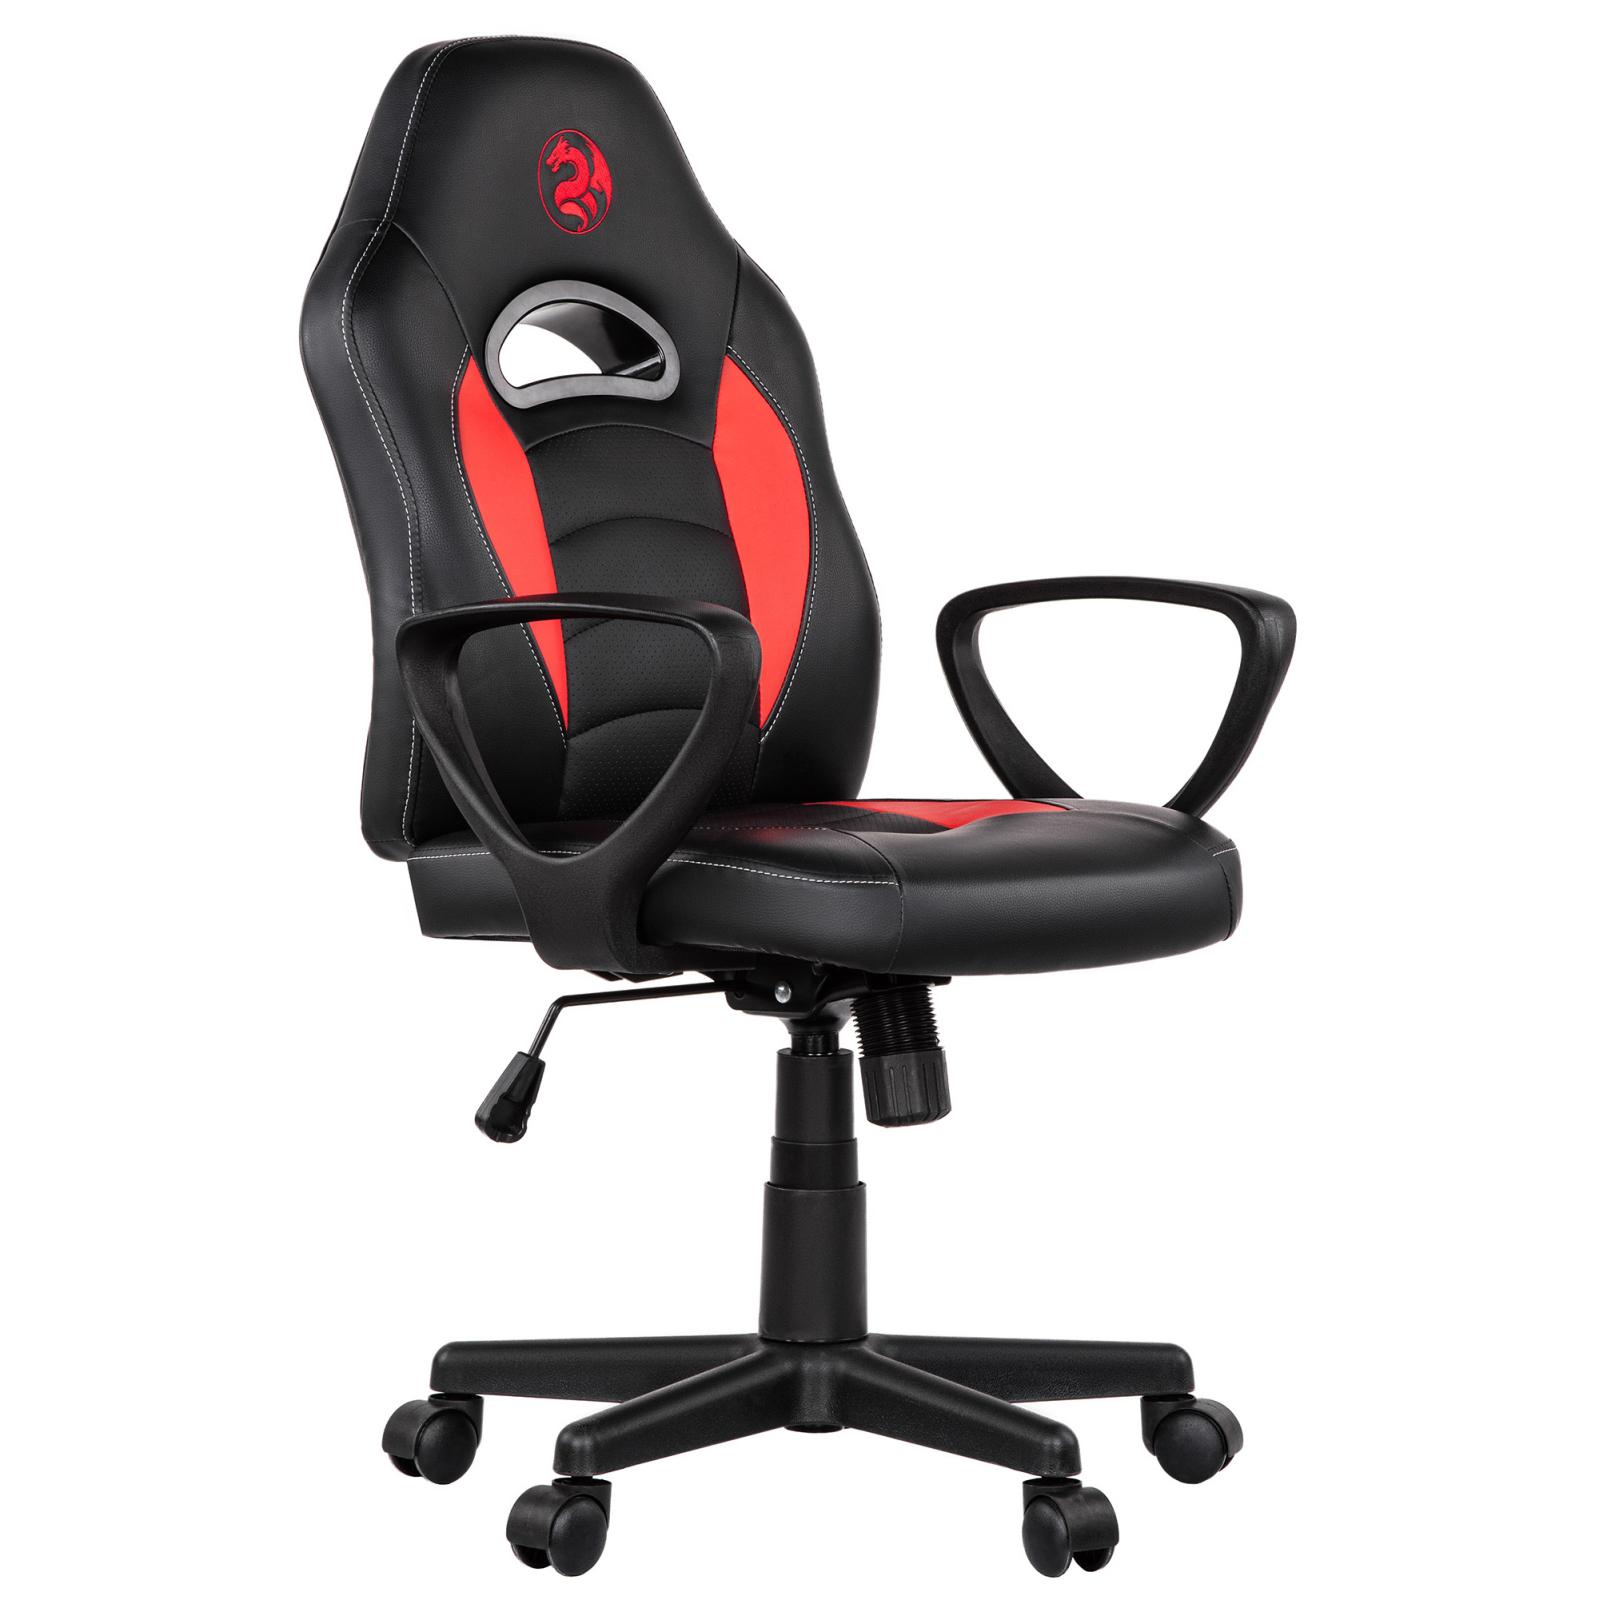 Крісло ігрове 2E GC21 (JUNIOR) Black/Red (2E-GC21BLR)